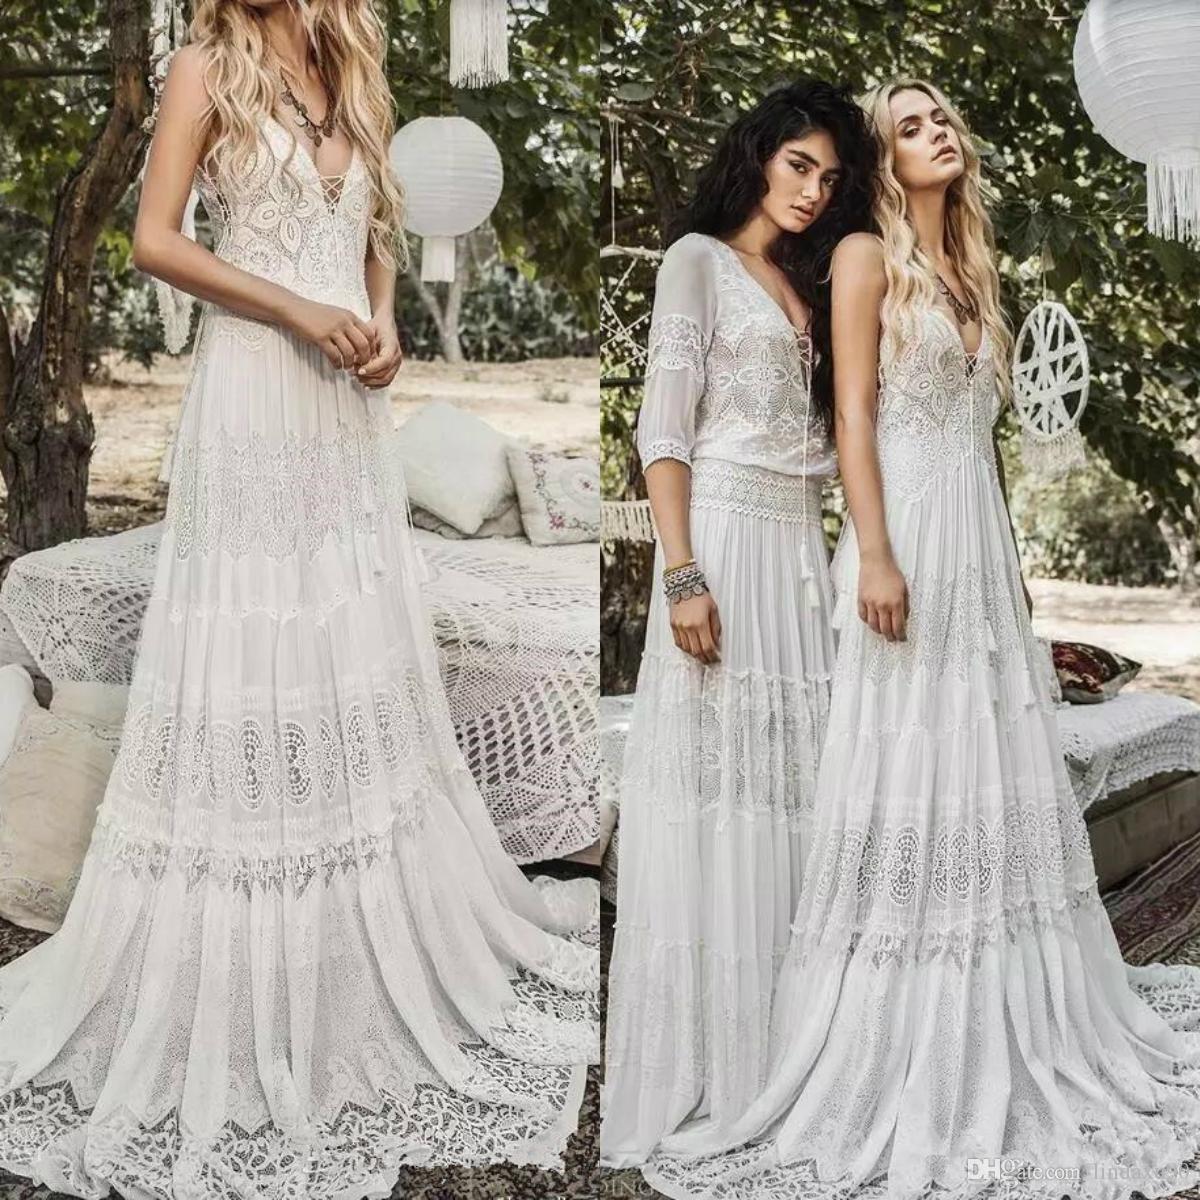 Discount Bohemian Flowy Chiffon Beach Wedding Dresses V Neck Cheap Boho  Bridal Gowns A Line Sexy Lace Appliqued Wedding Dress Vestidos De Novia  Wedding ... 0300d5baf613